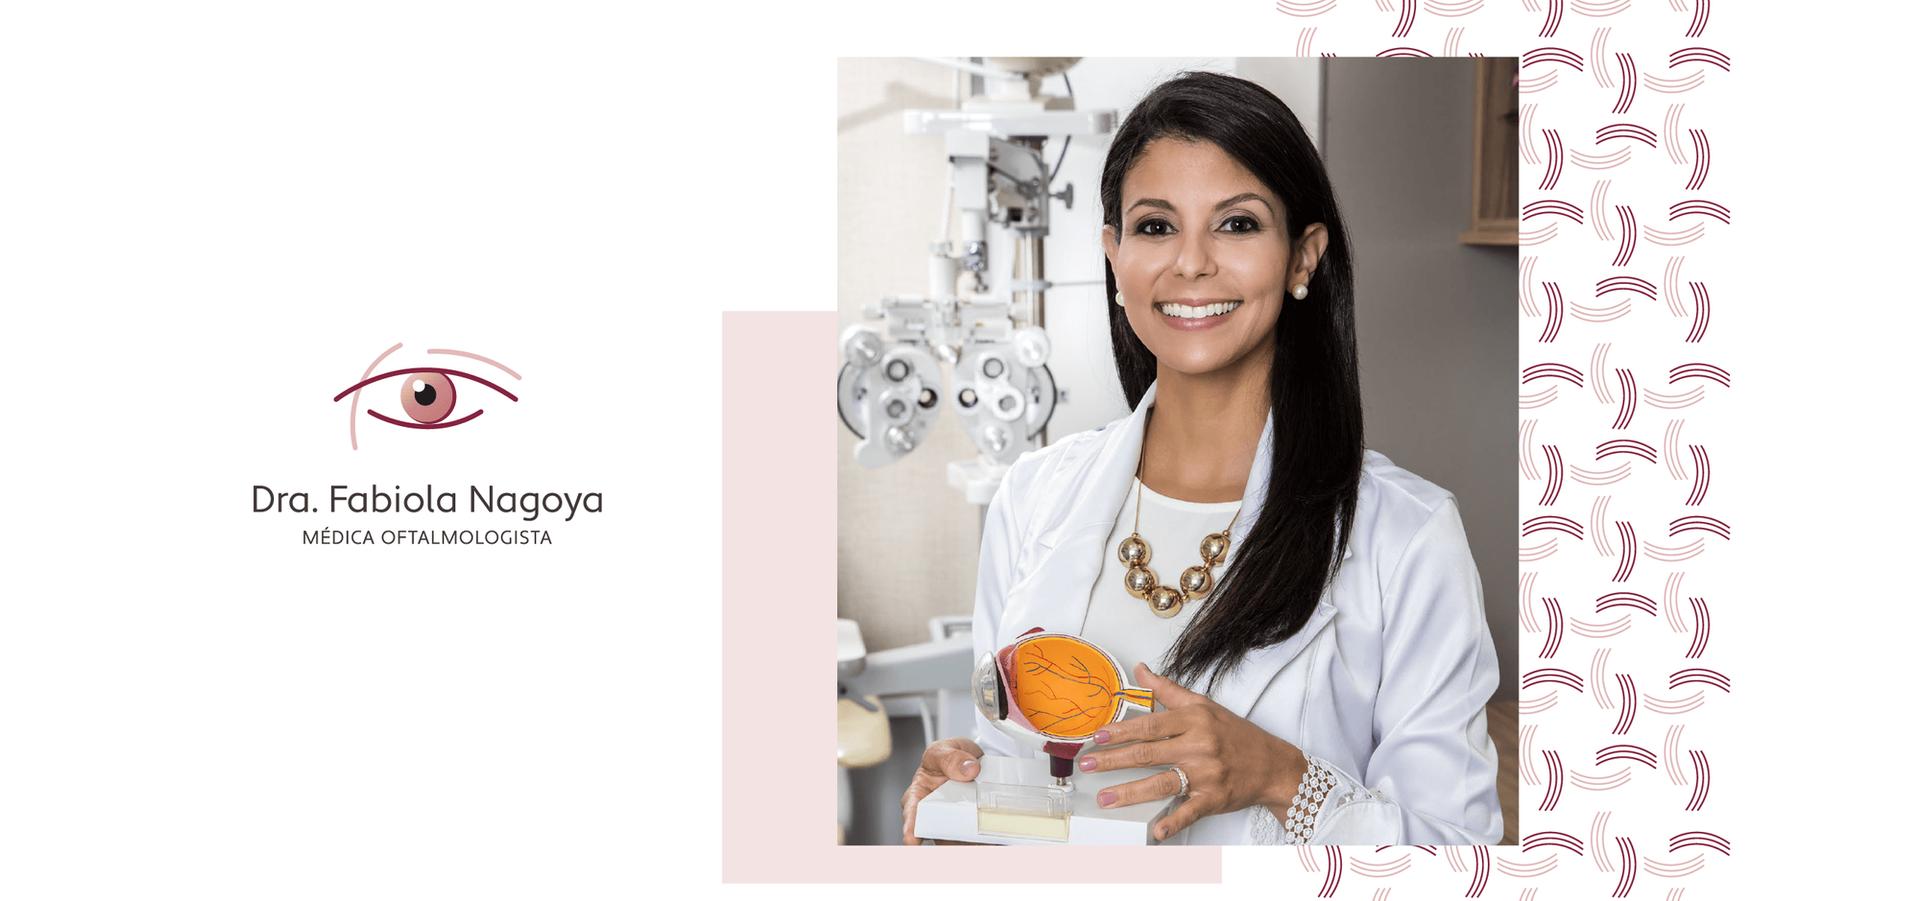 Business portrait of Dra. Fabiola Nagoya